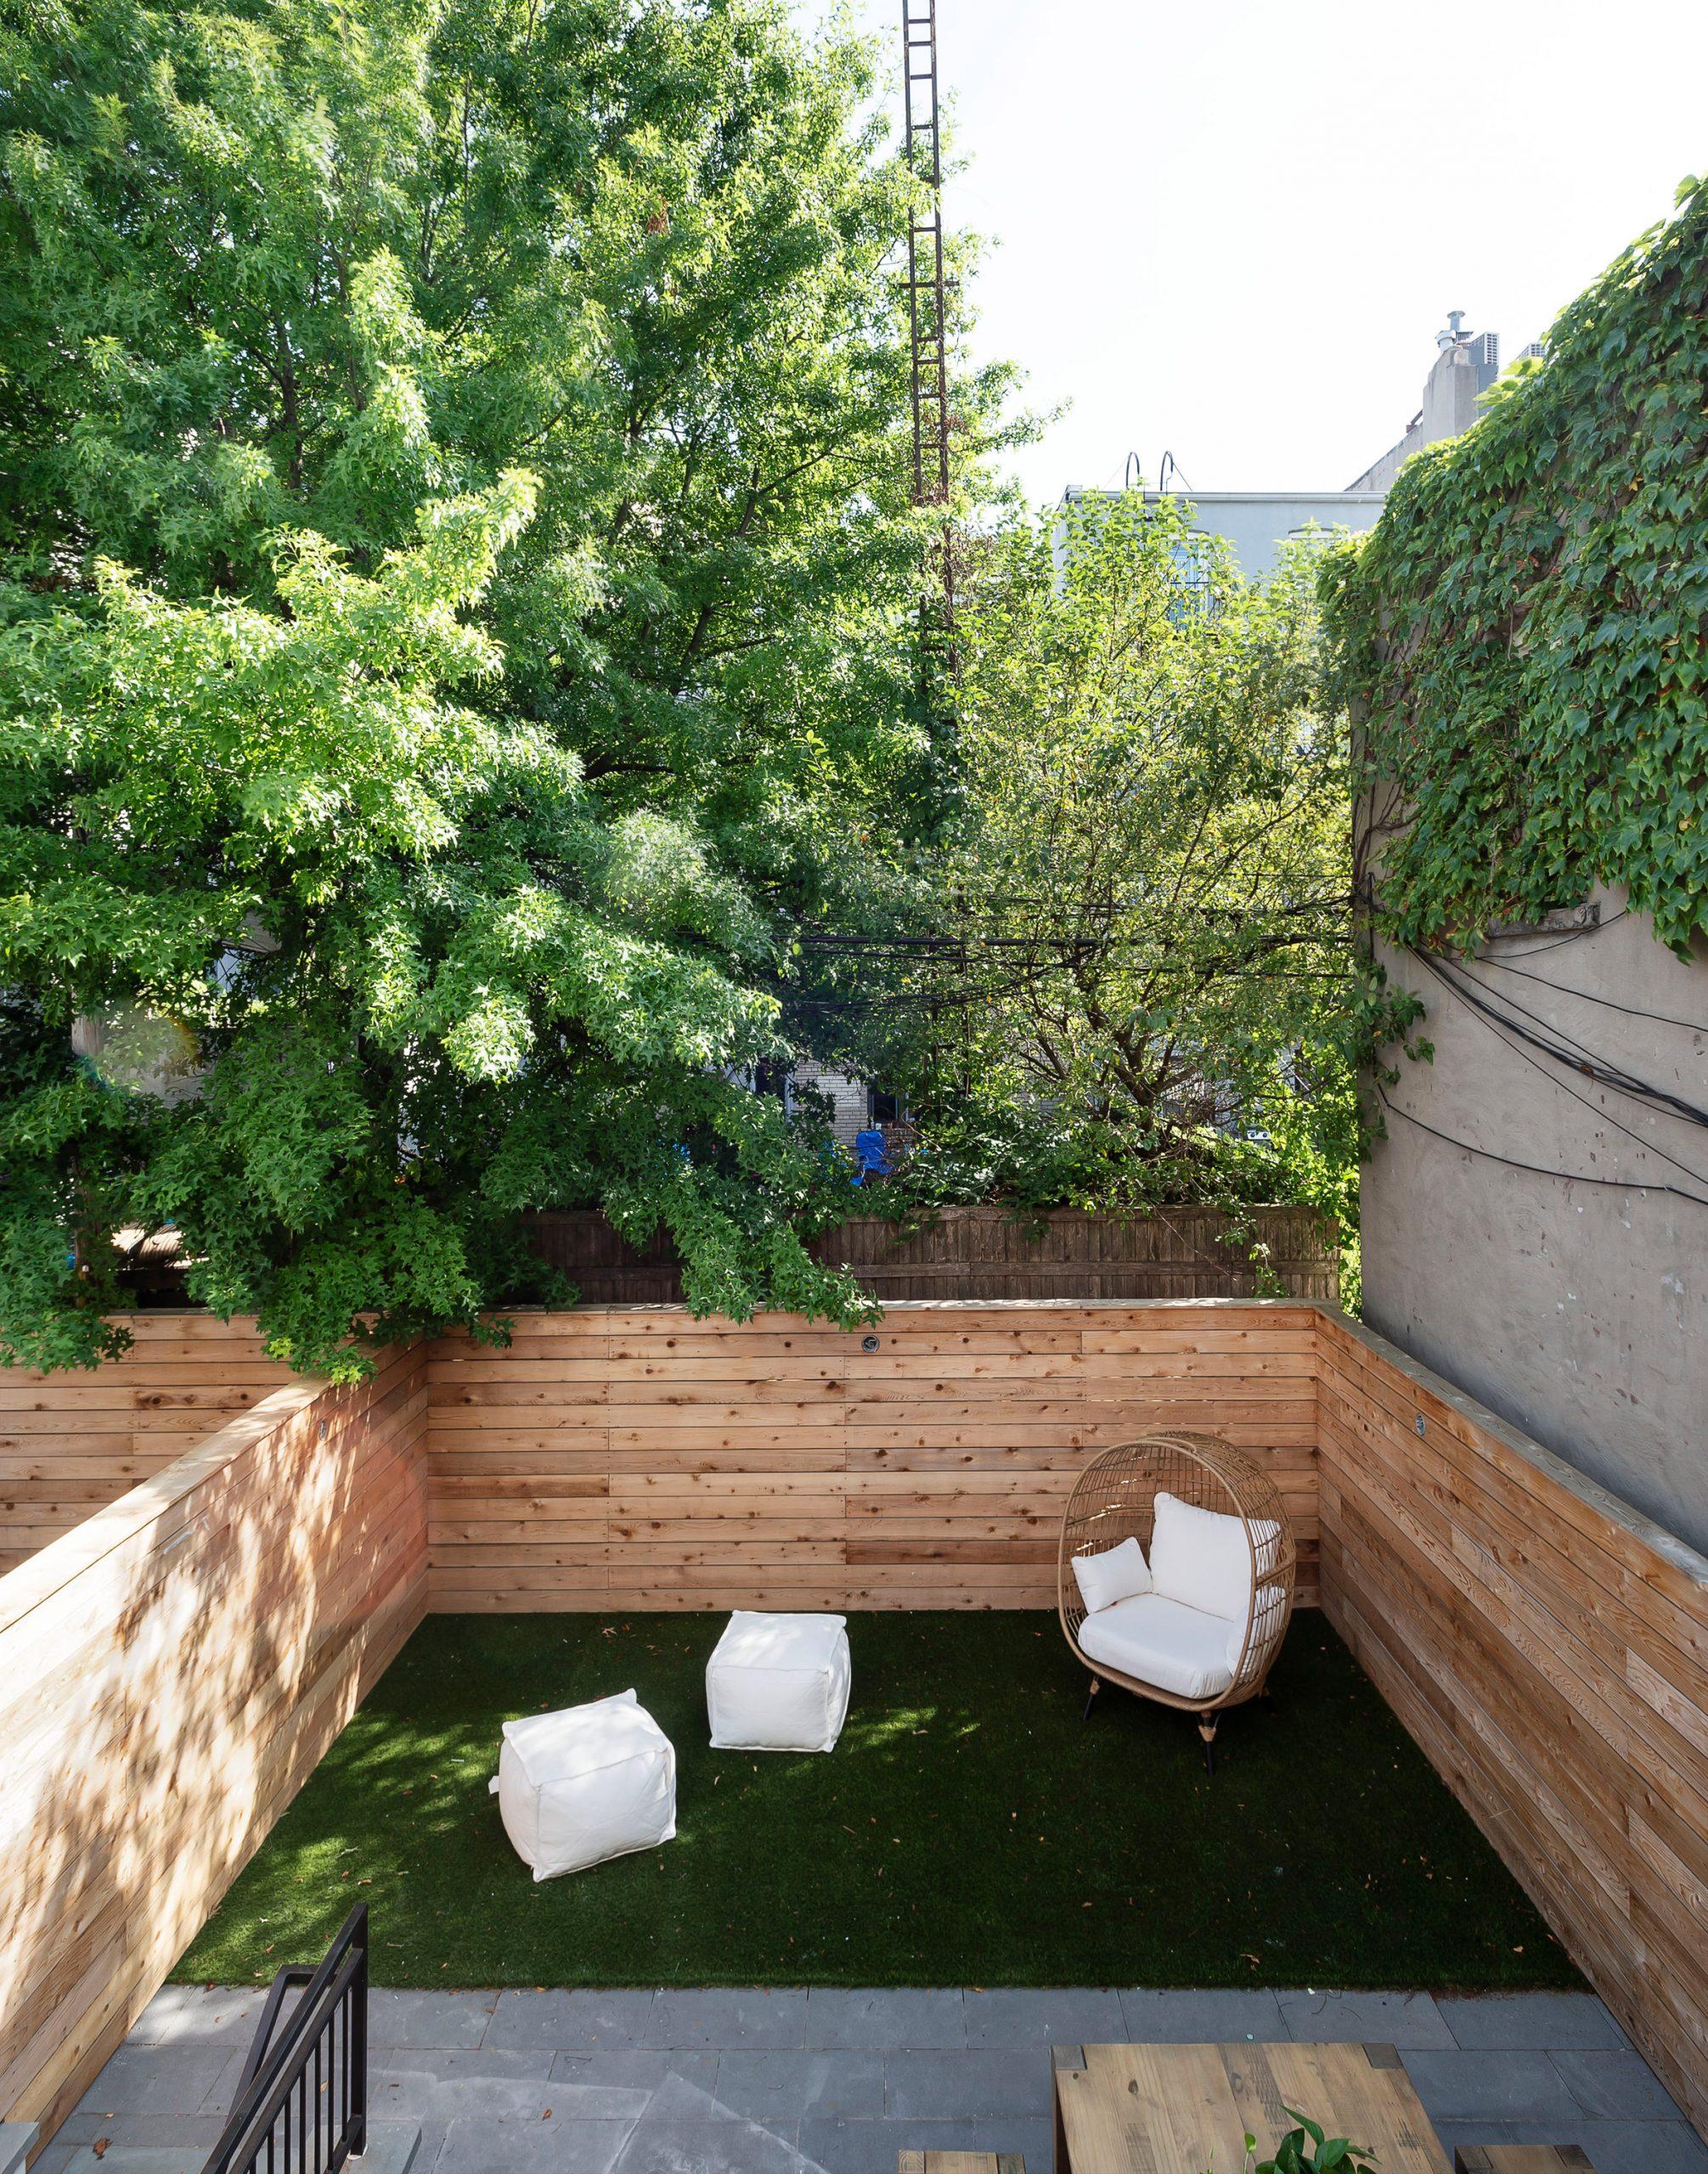 The Sackett Street townhouse intimate back garden